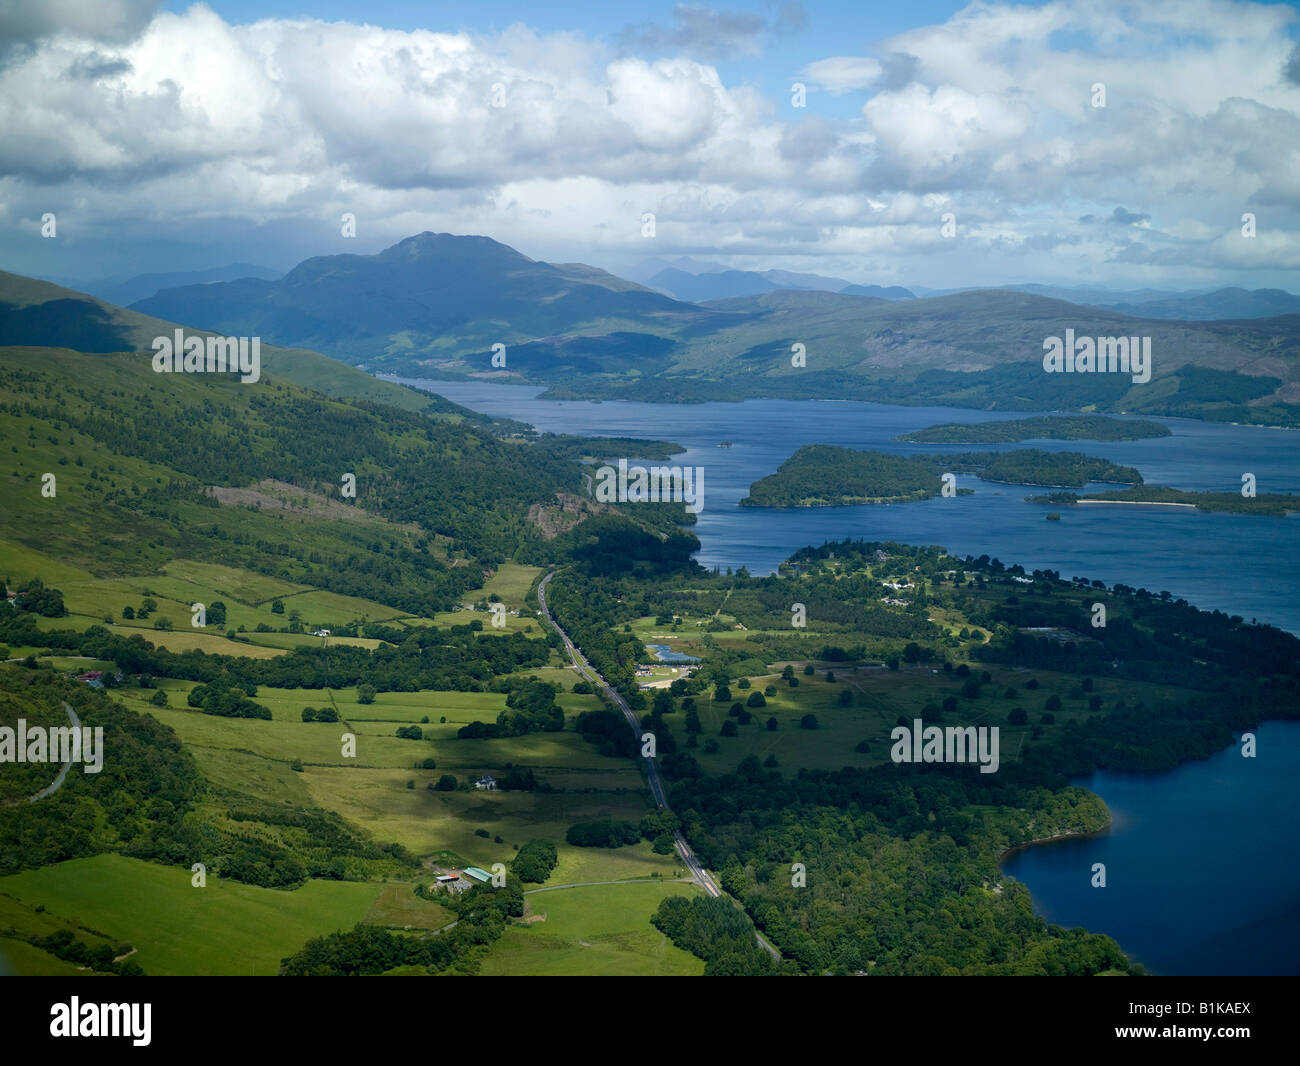 Loch Lomond & Ben Lomond from the air, Highland Scotland - Stock Image